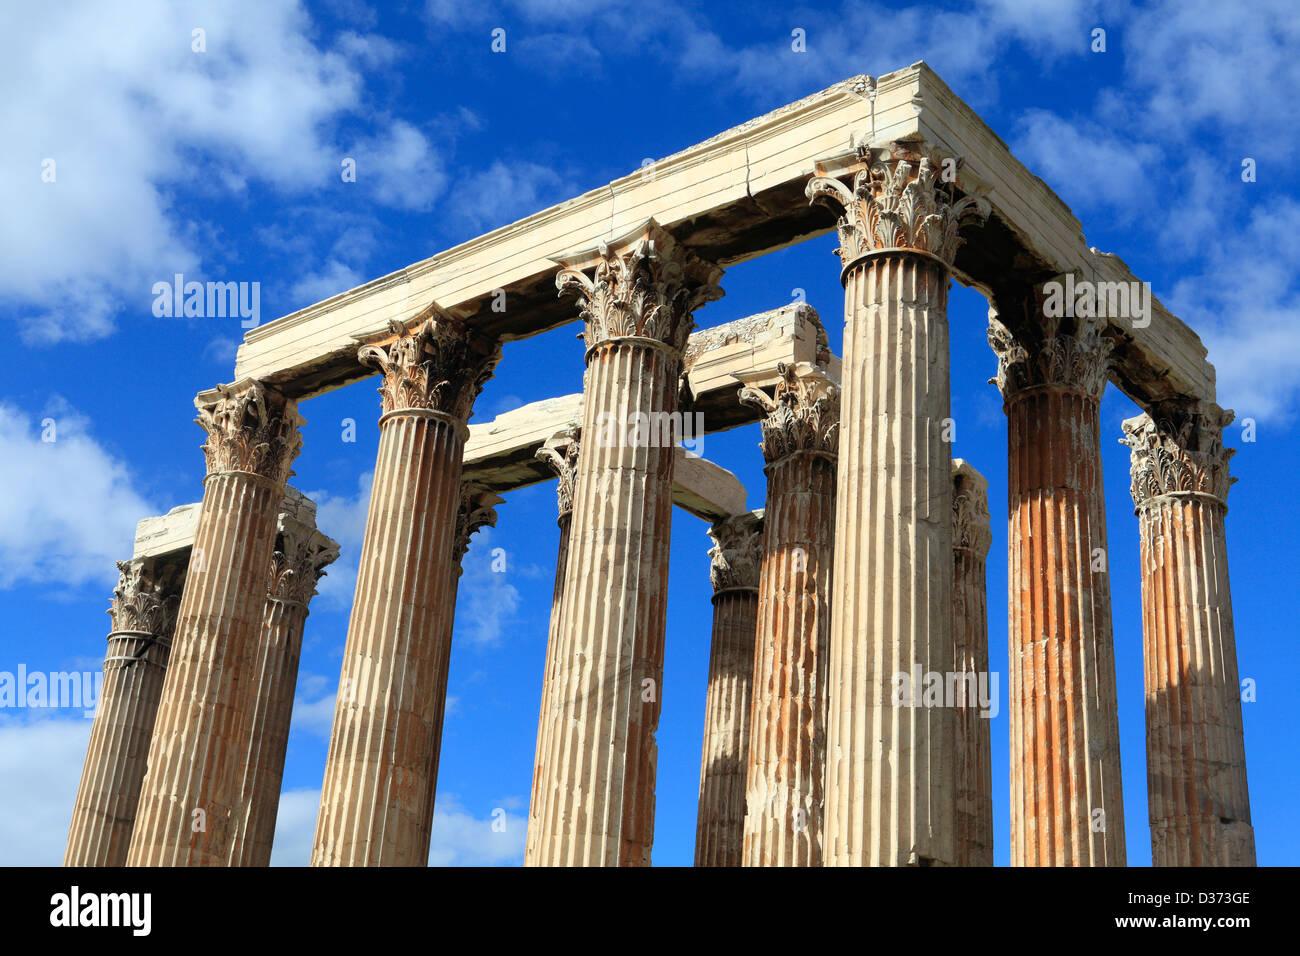 greece attica athens the temple of olympian zeus - Stock Image